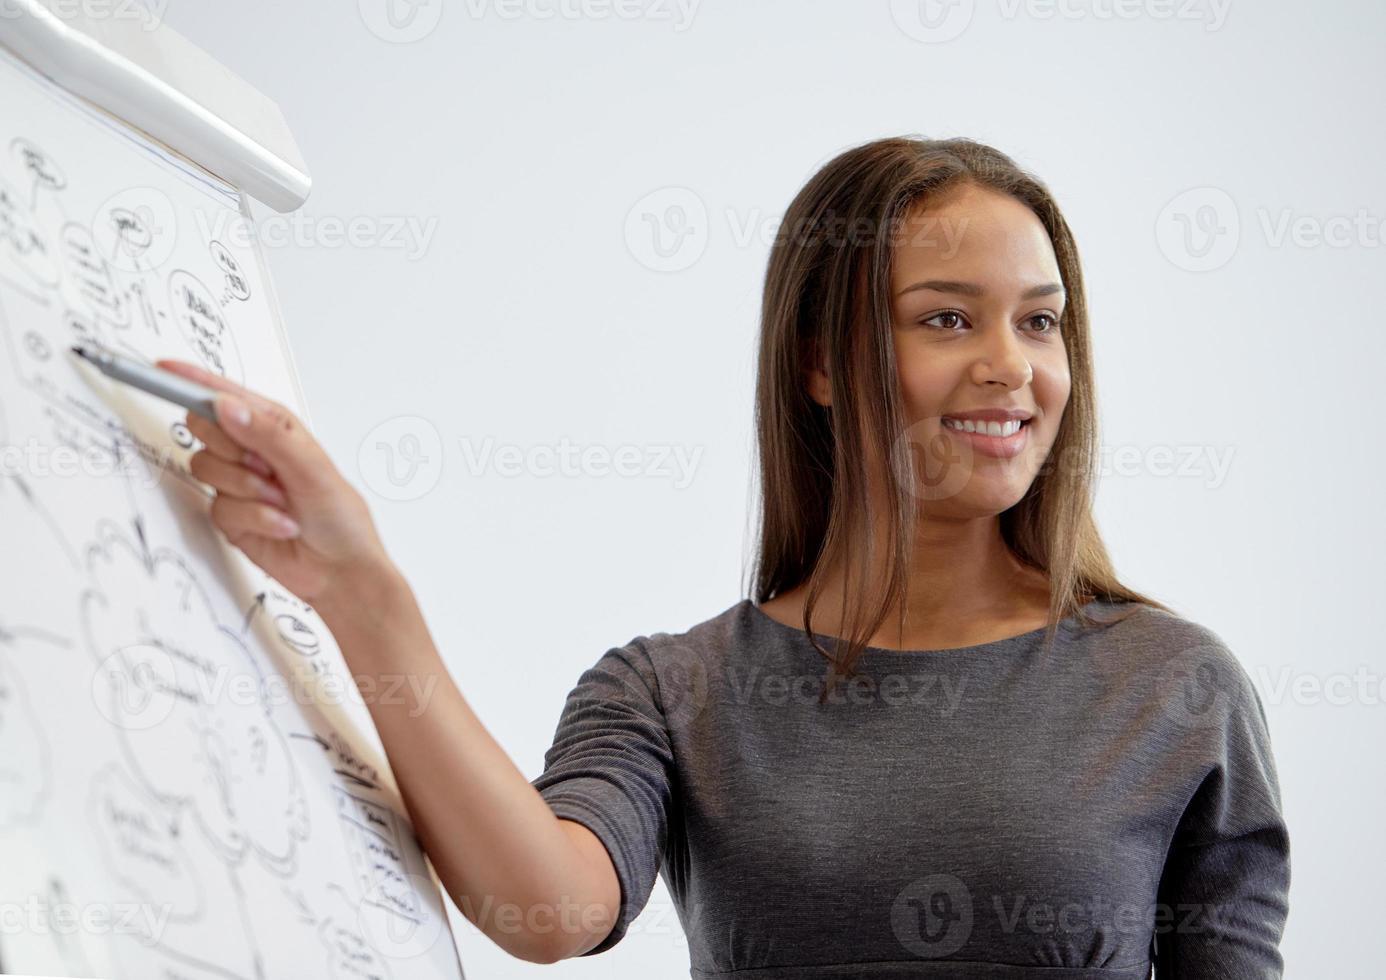 Glimlachende zakenvrouw op presentatie in kantoor foto